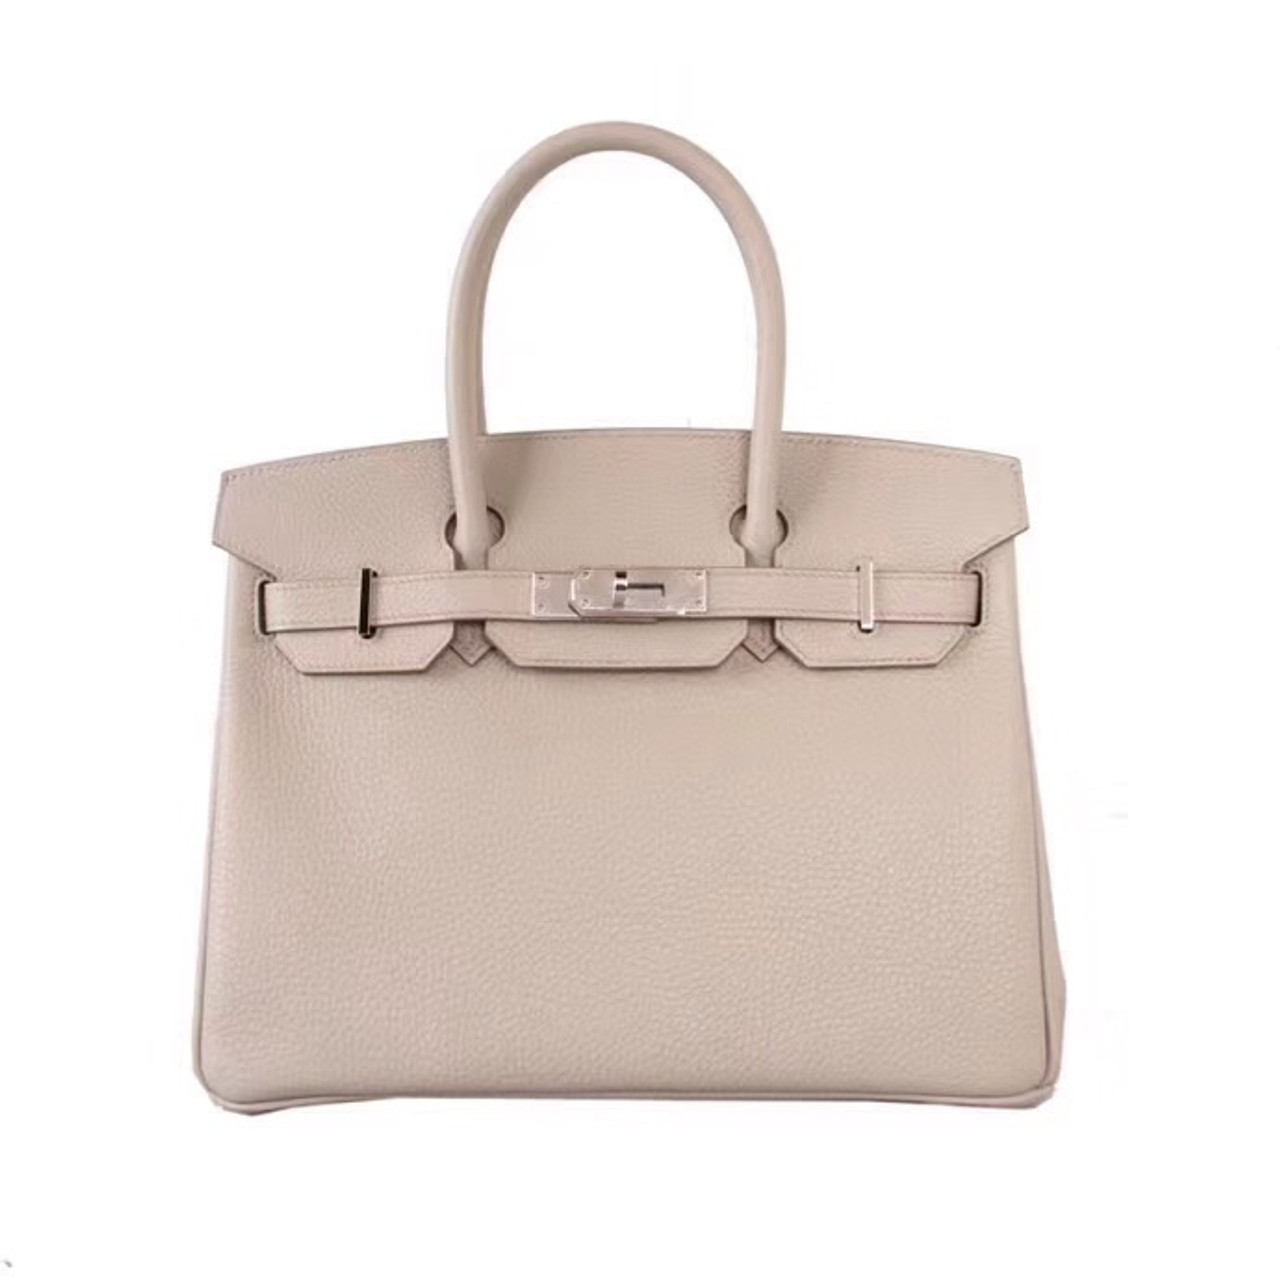 7377e943978 Hermès 80 Gris Perle Birkin 30 cm Togo Leather Palladium Hardware ...